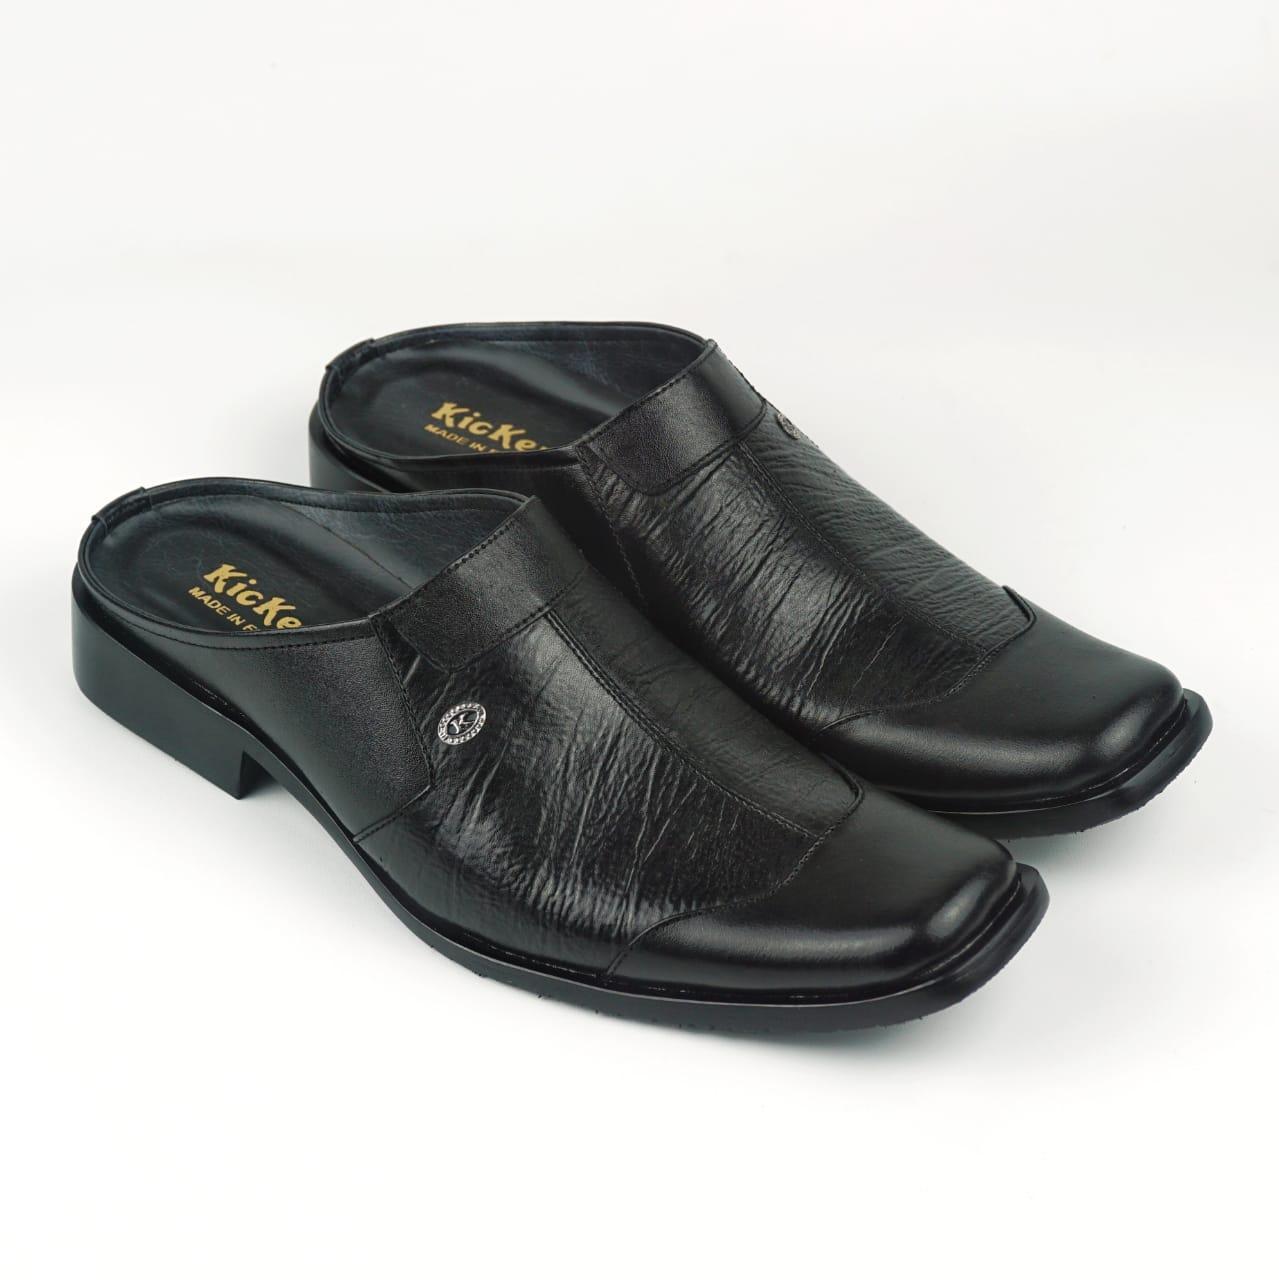 rosty – sandal wedges wanita – sandal fl disruptor – terlaris – bester -bisa bayar tempat(cod)